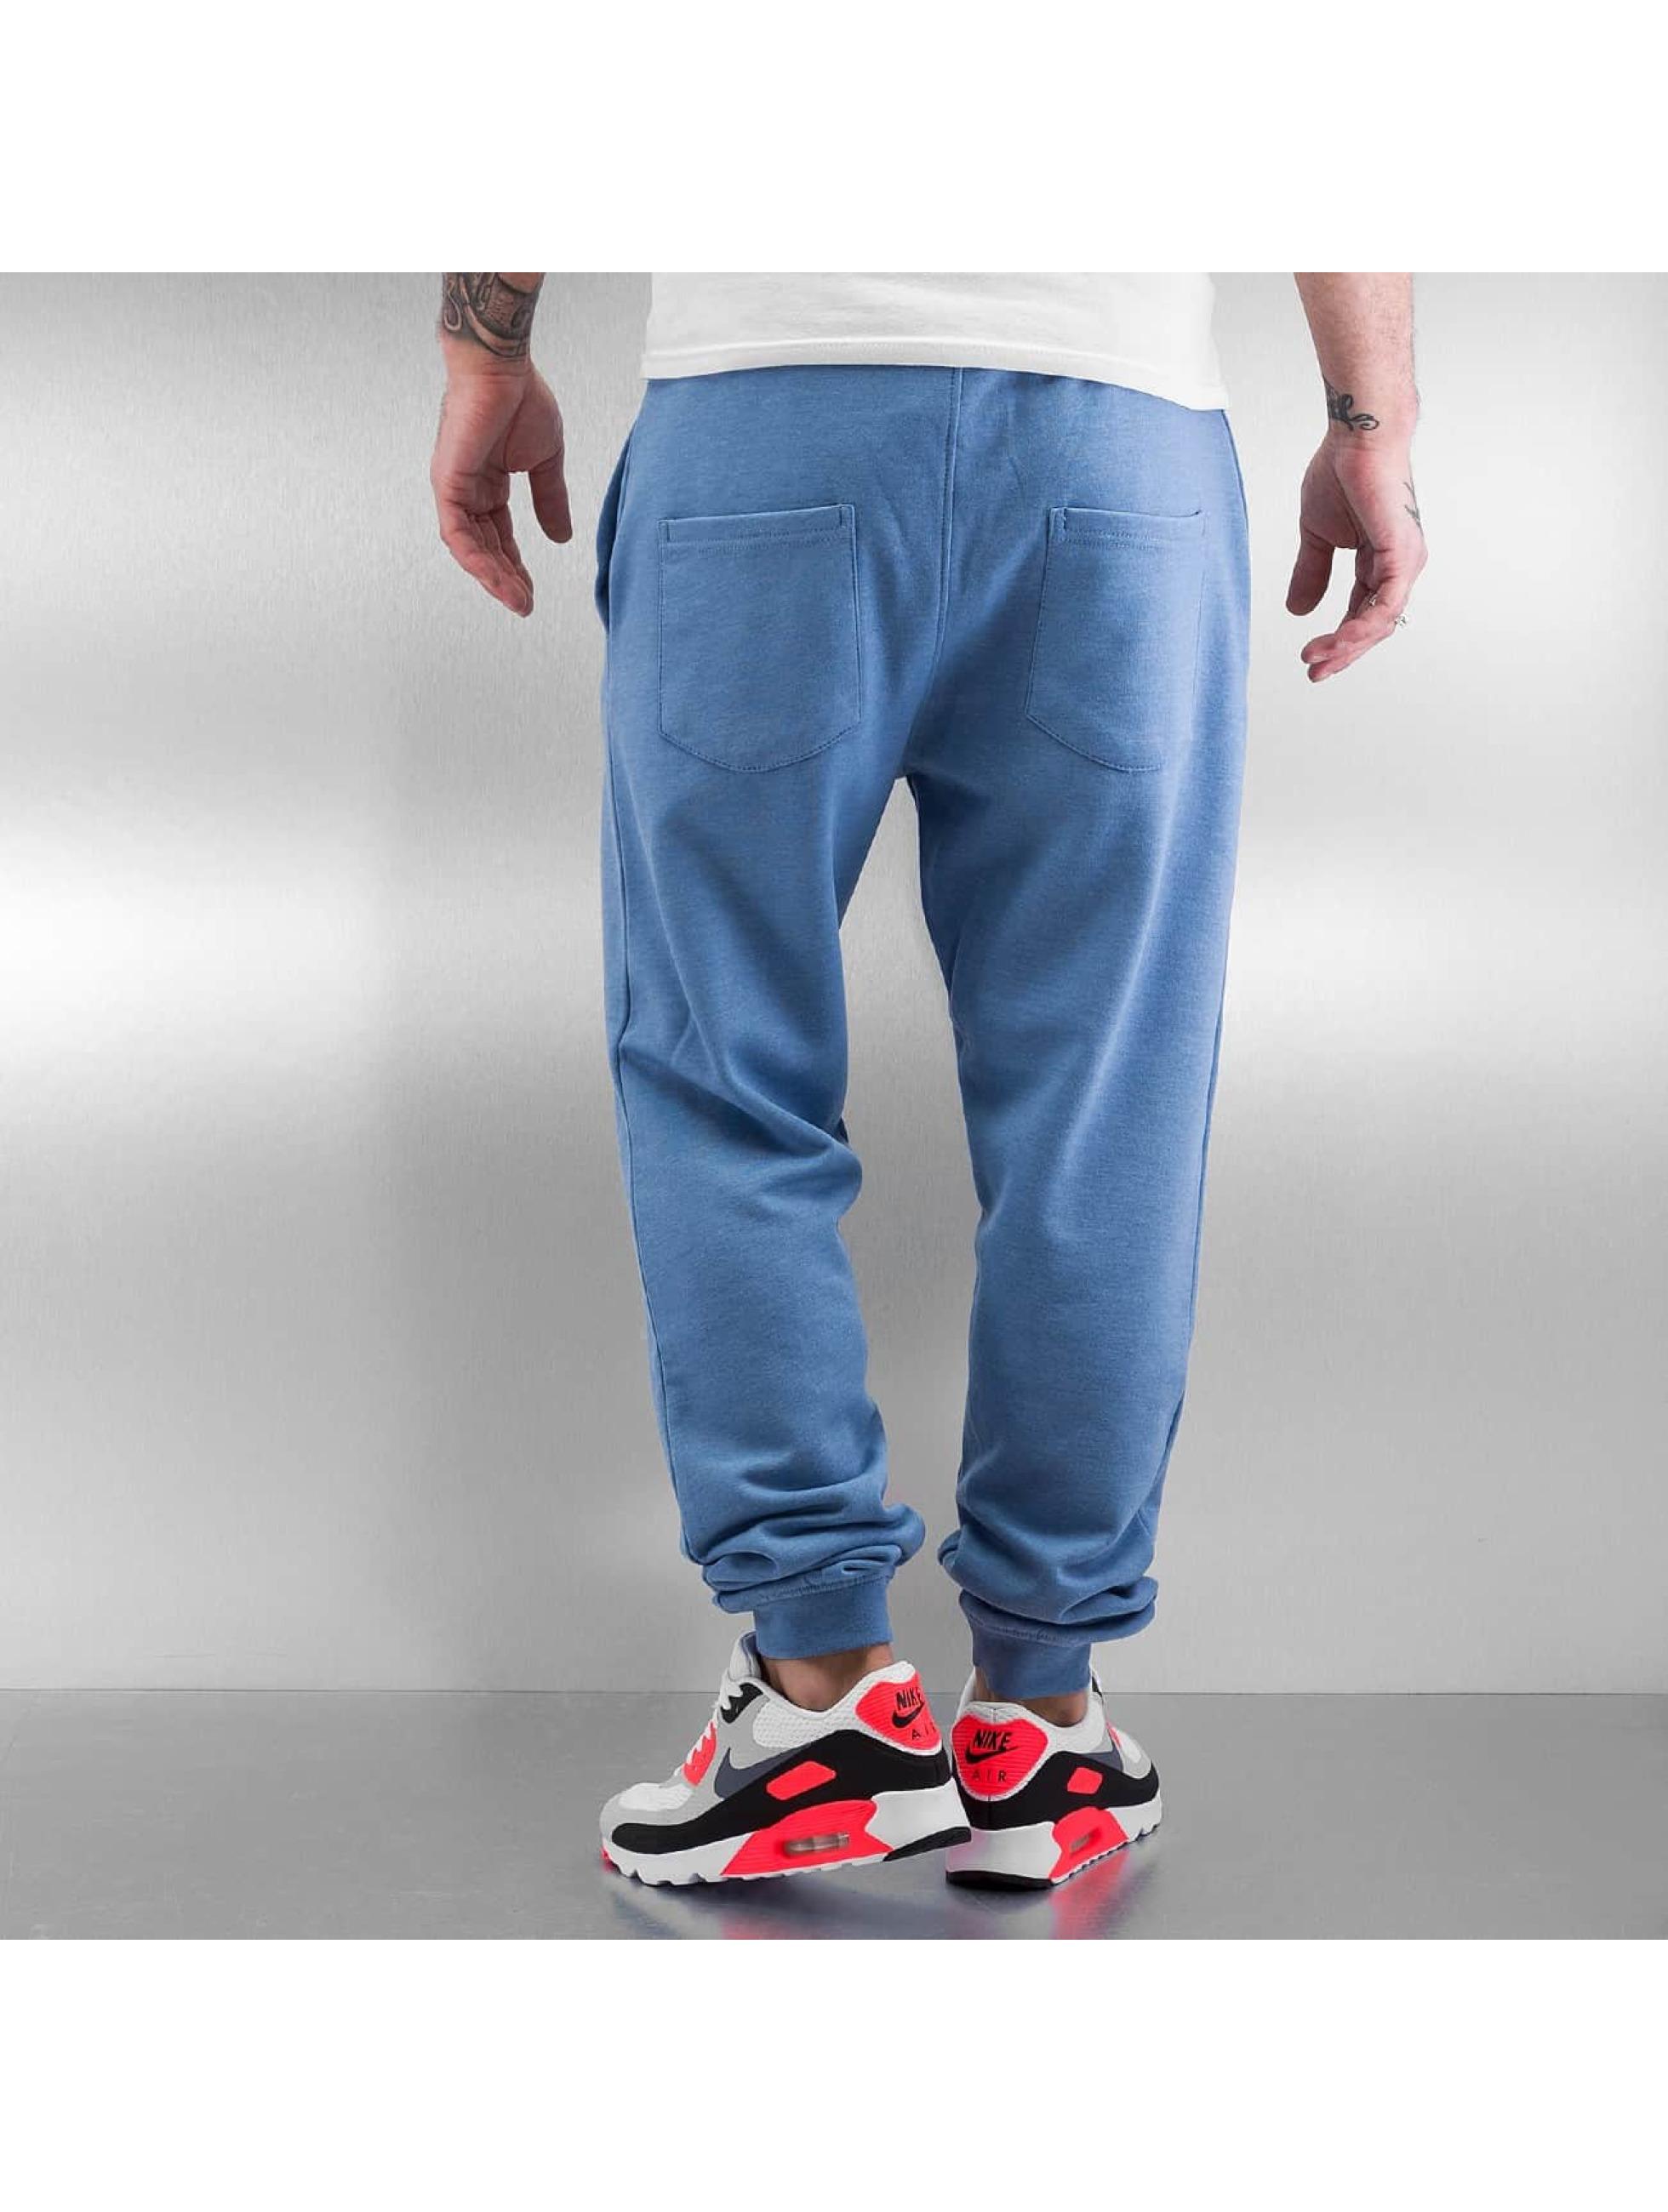 Cyprime Spodnie do joggingu Pavo niebieski